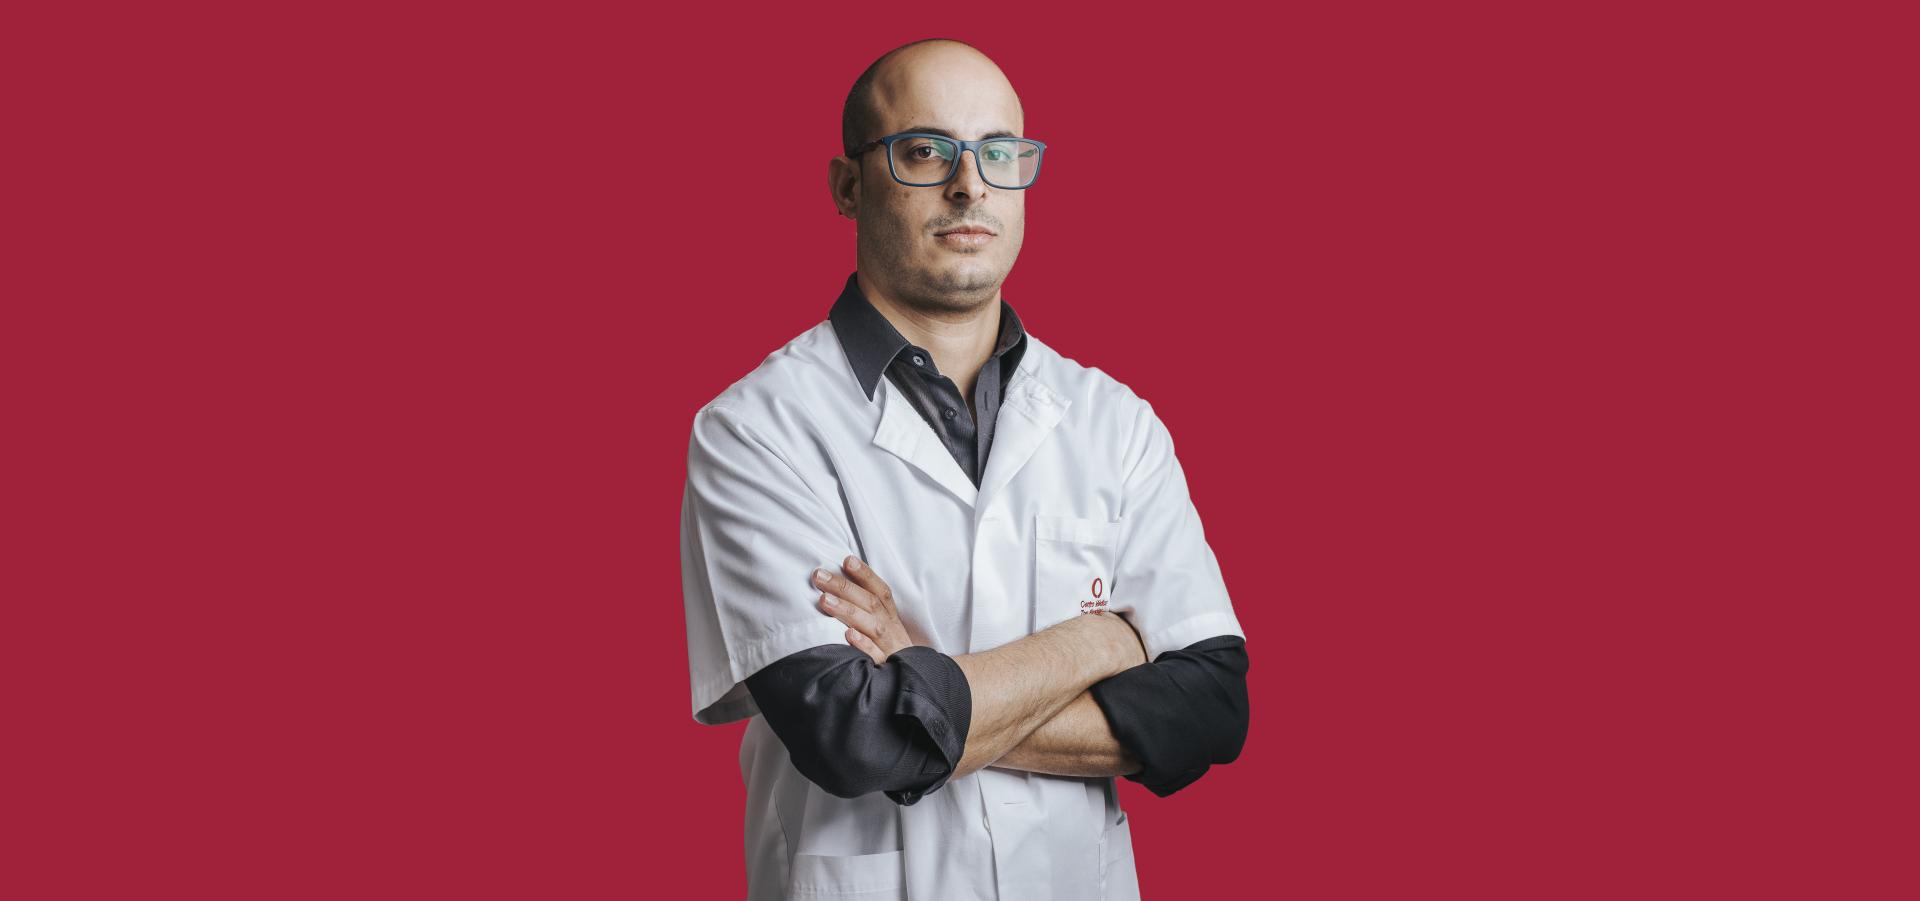 Dr. Airam Sadarangani Pestana